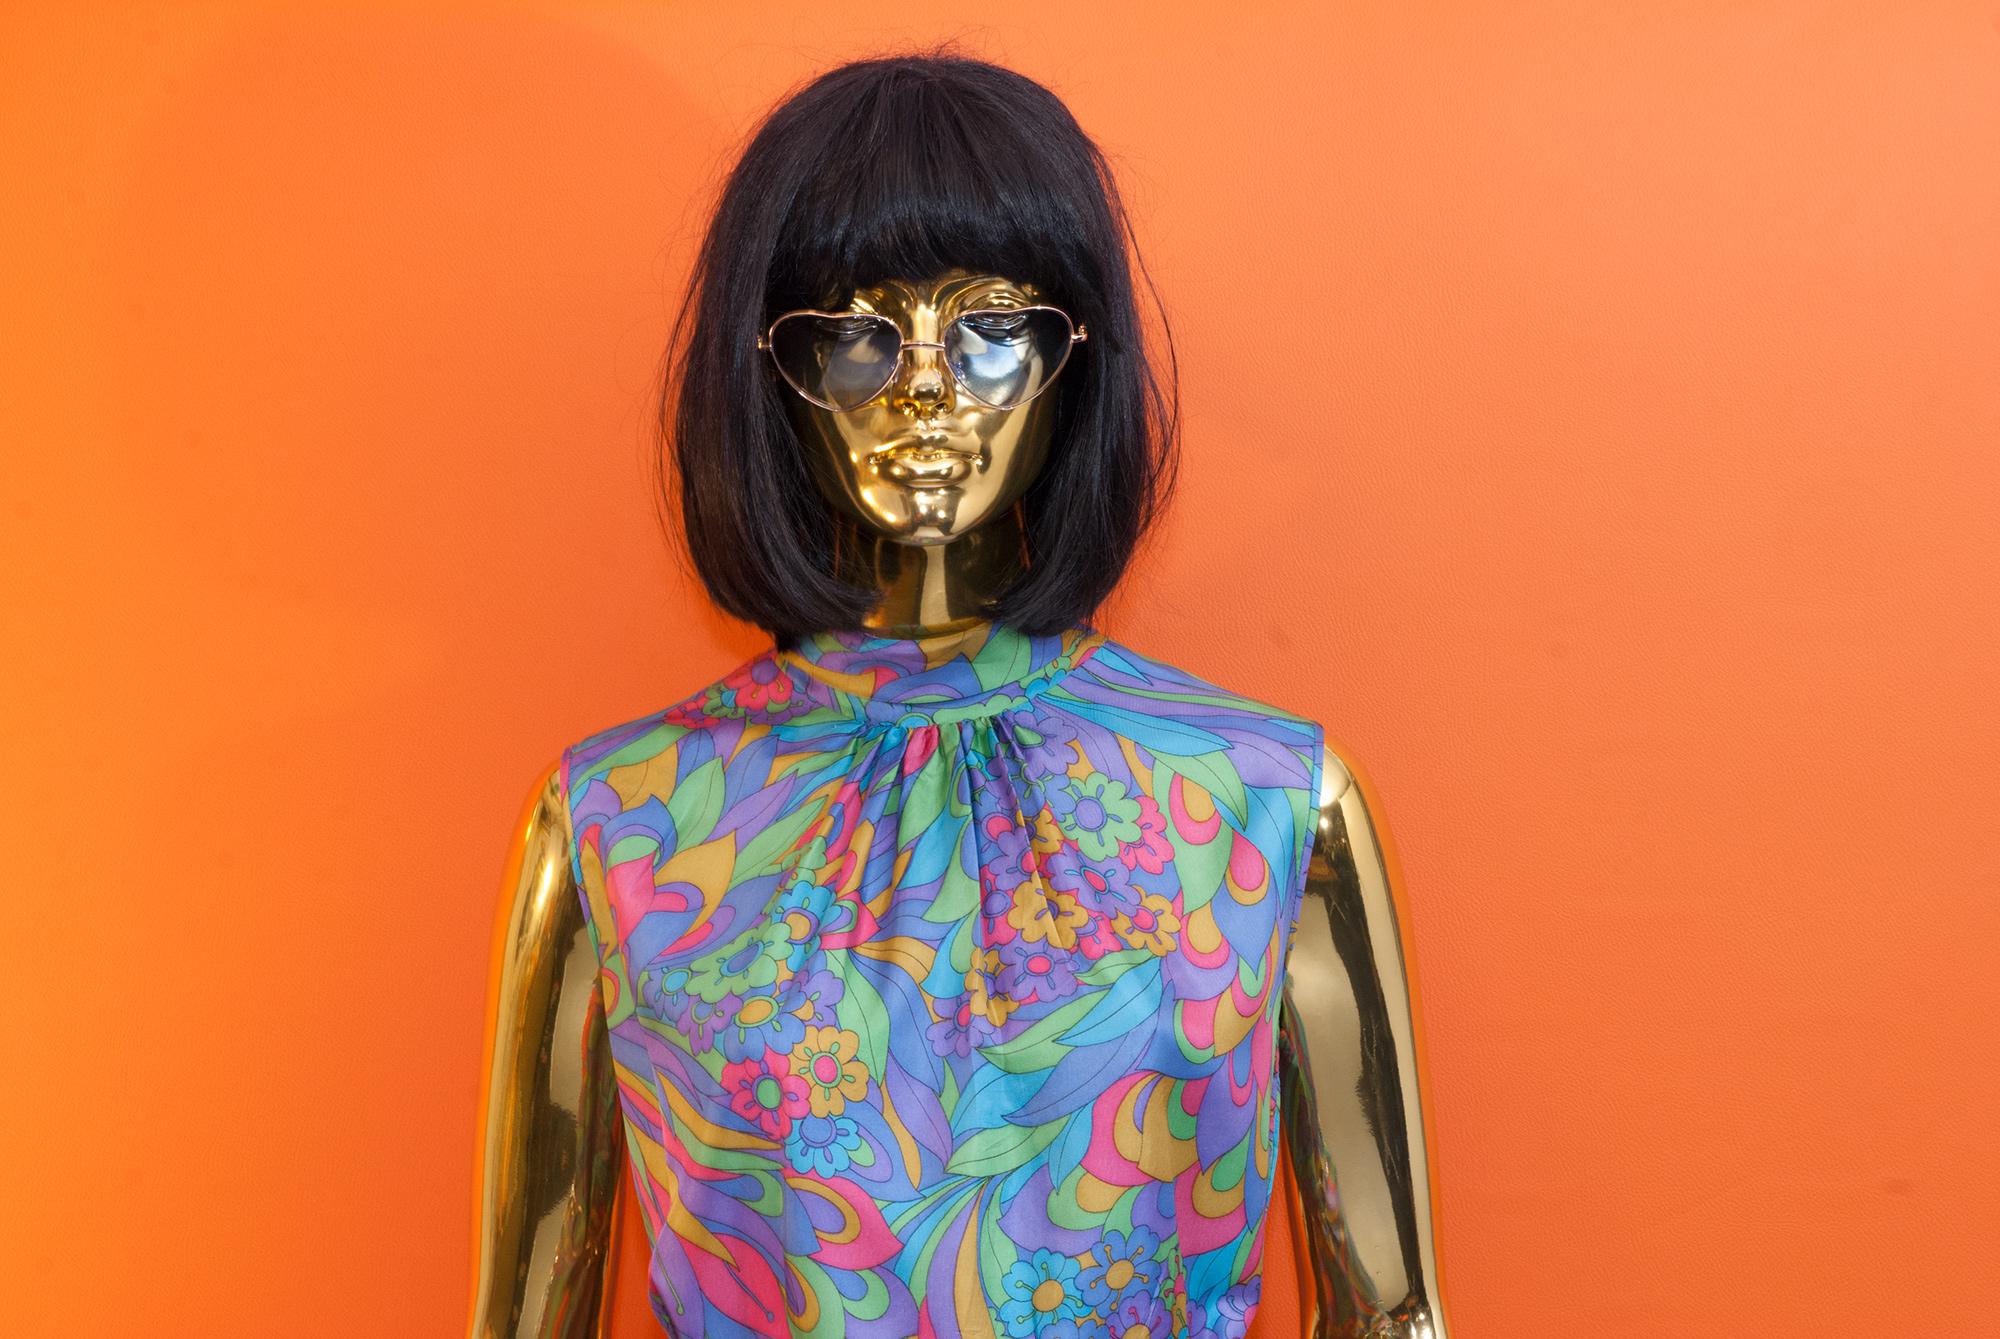 60's Psychedelic Satin Dress